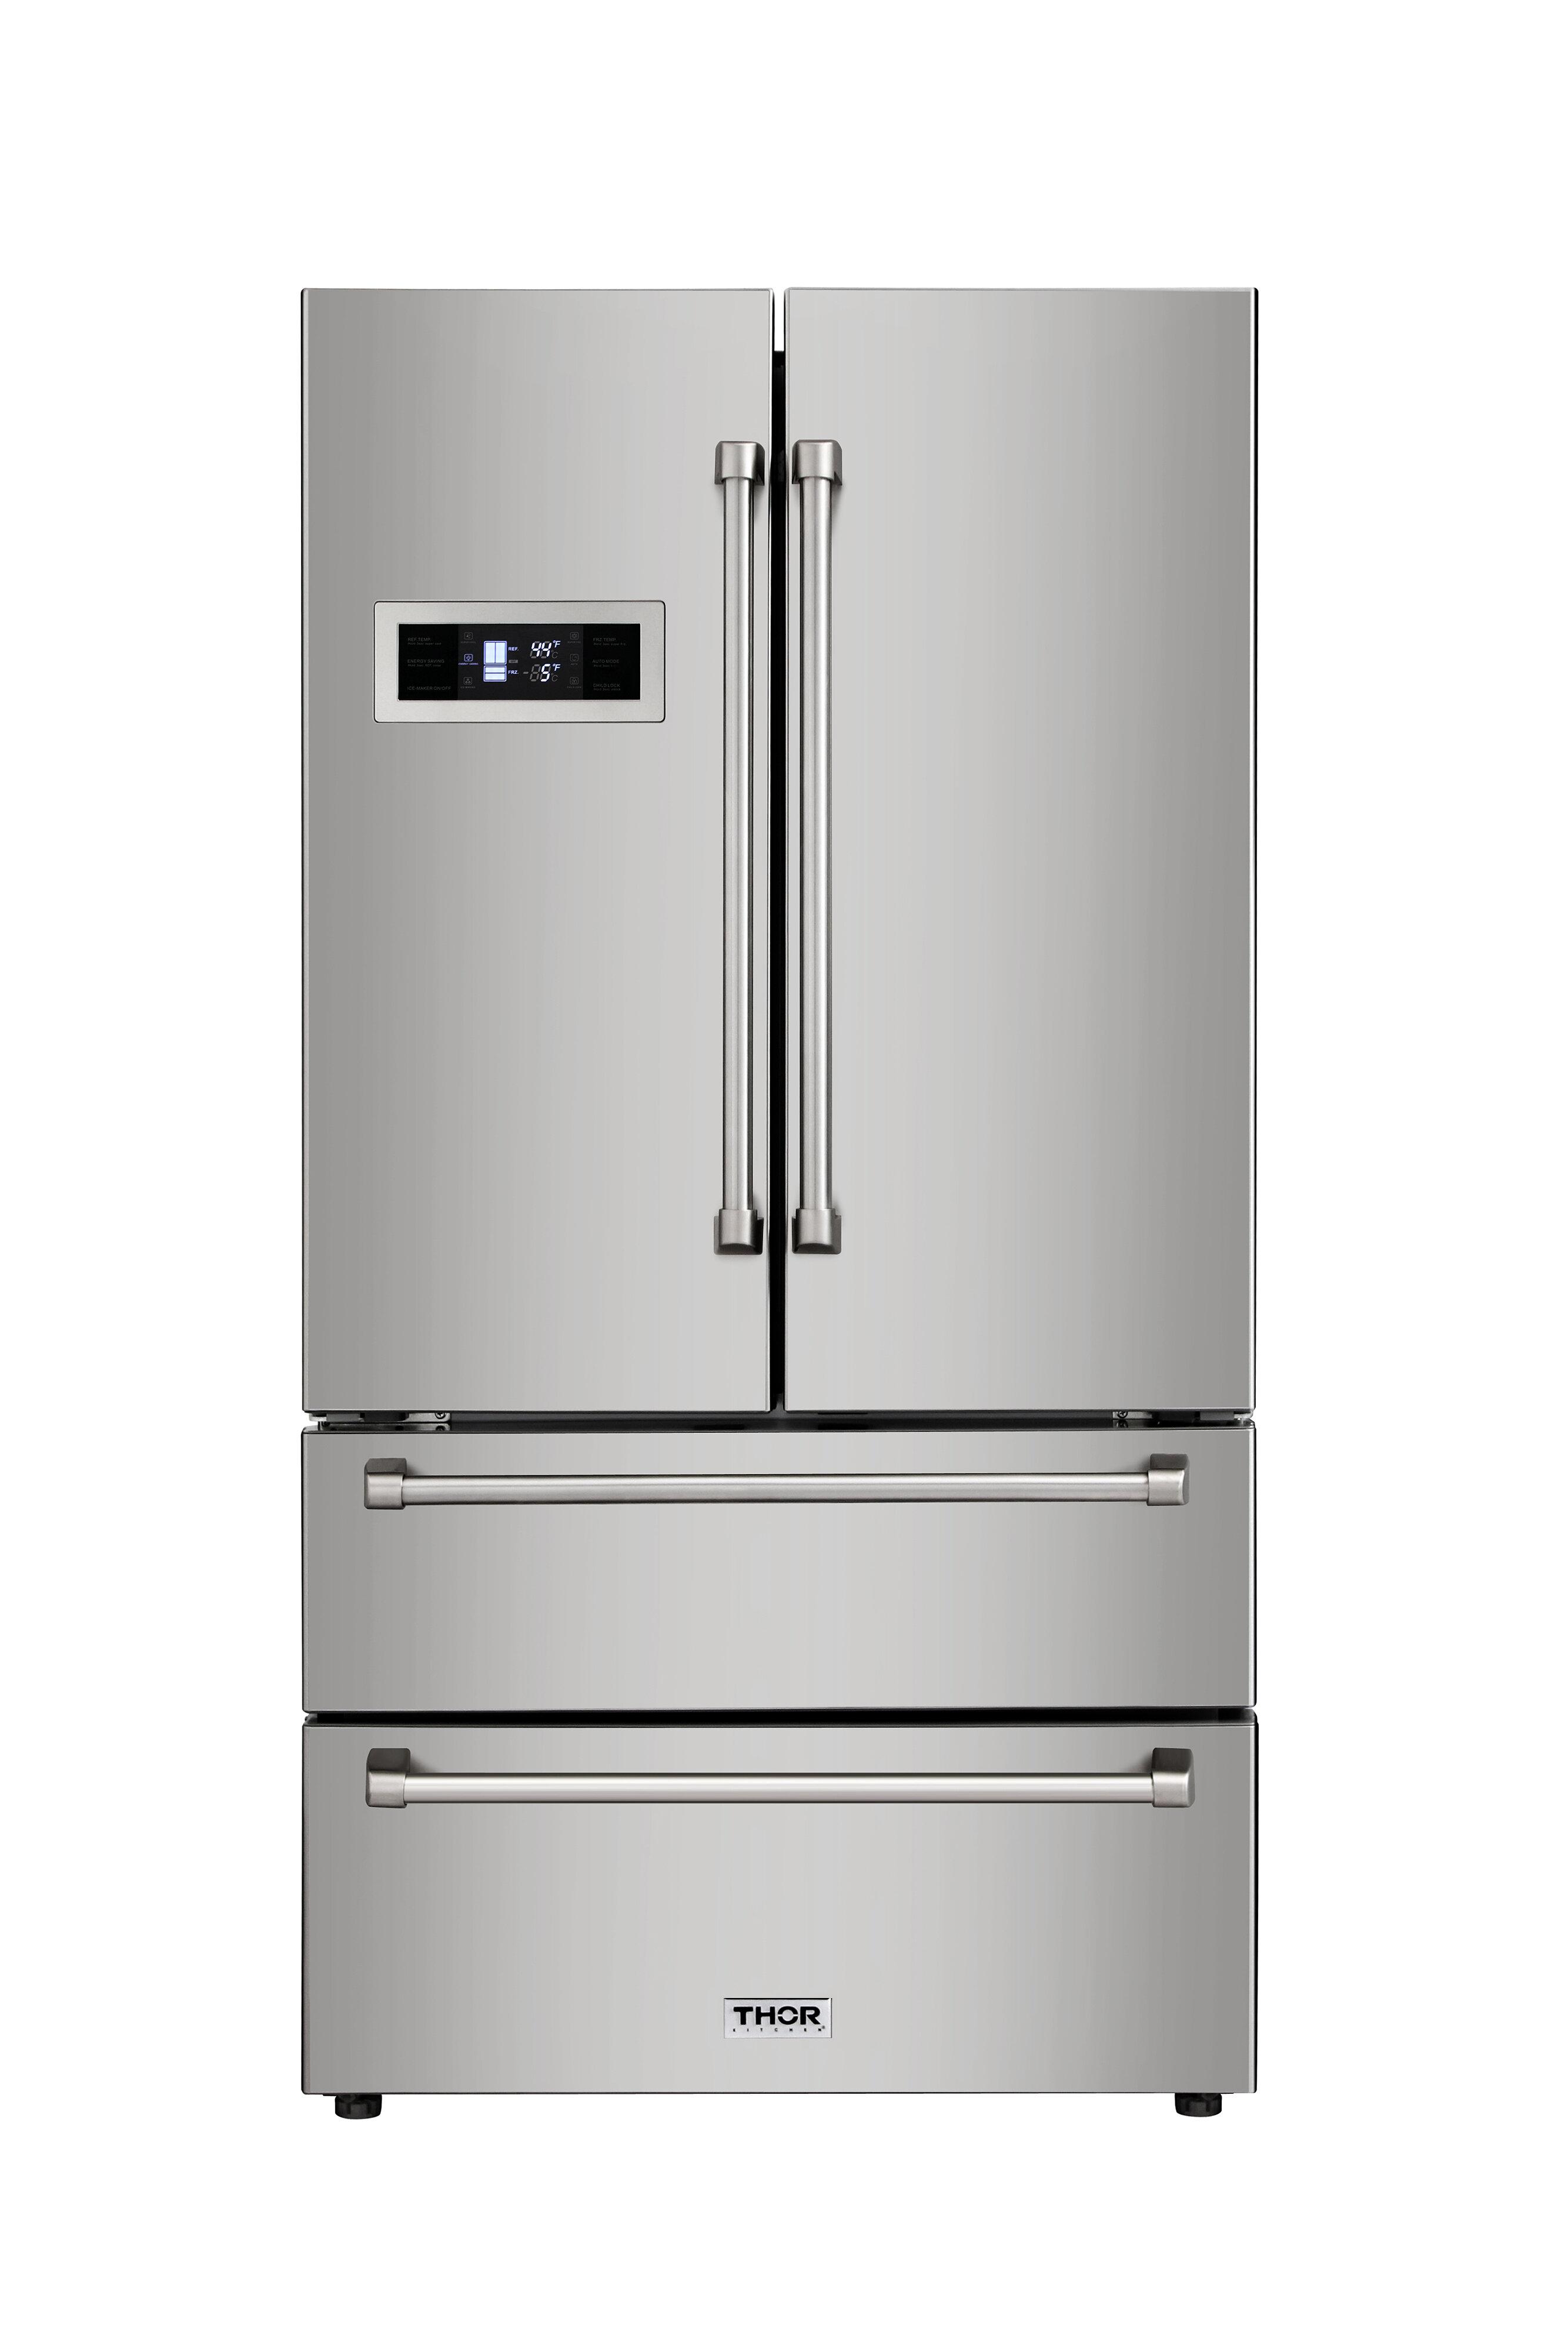 ThorKitchen 20.85 Cu. Ft. Counter Depth French Door Refrigerator U0026 Reviews    Wayfair